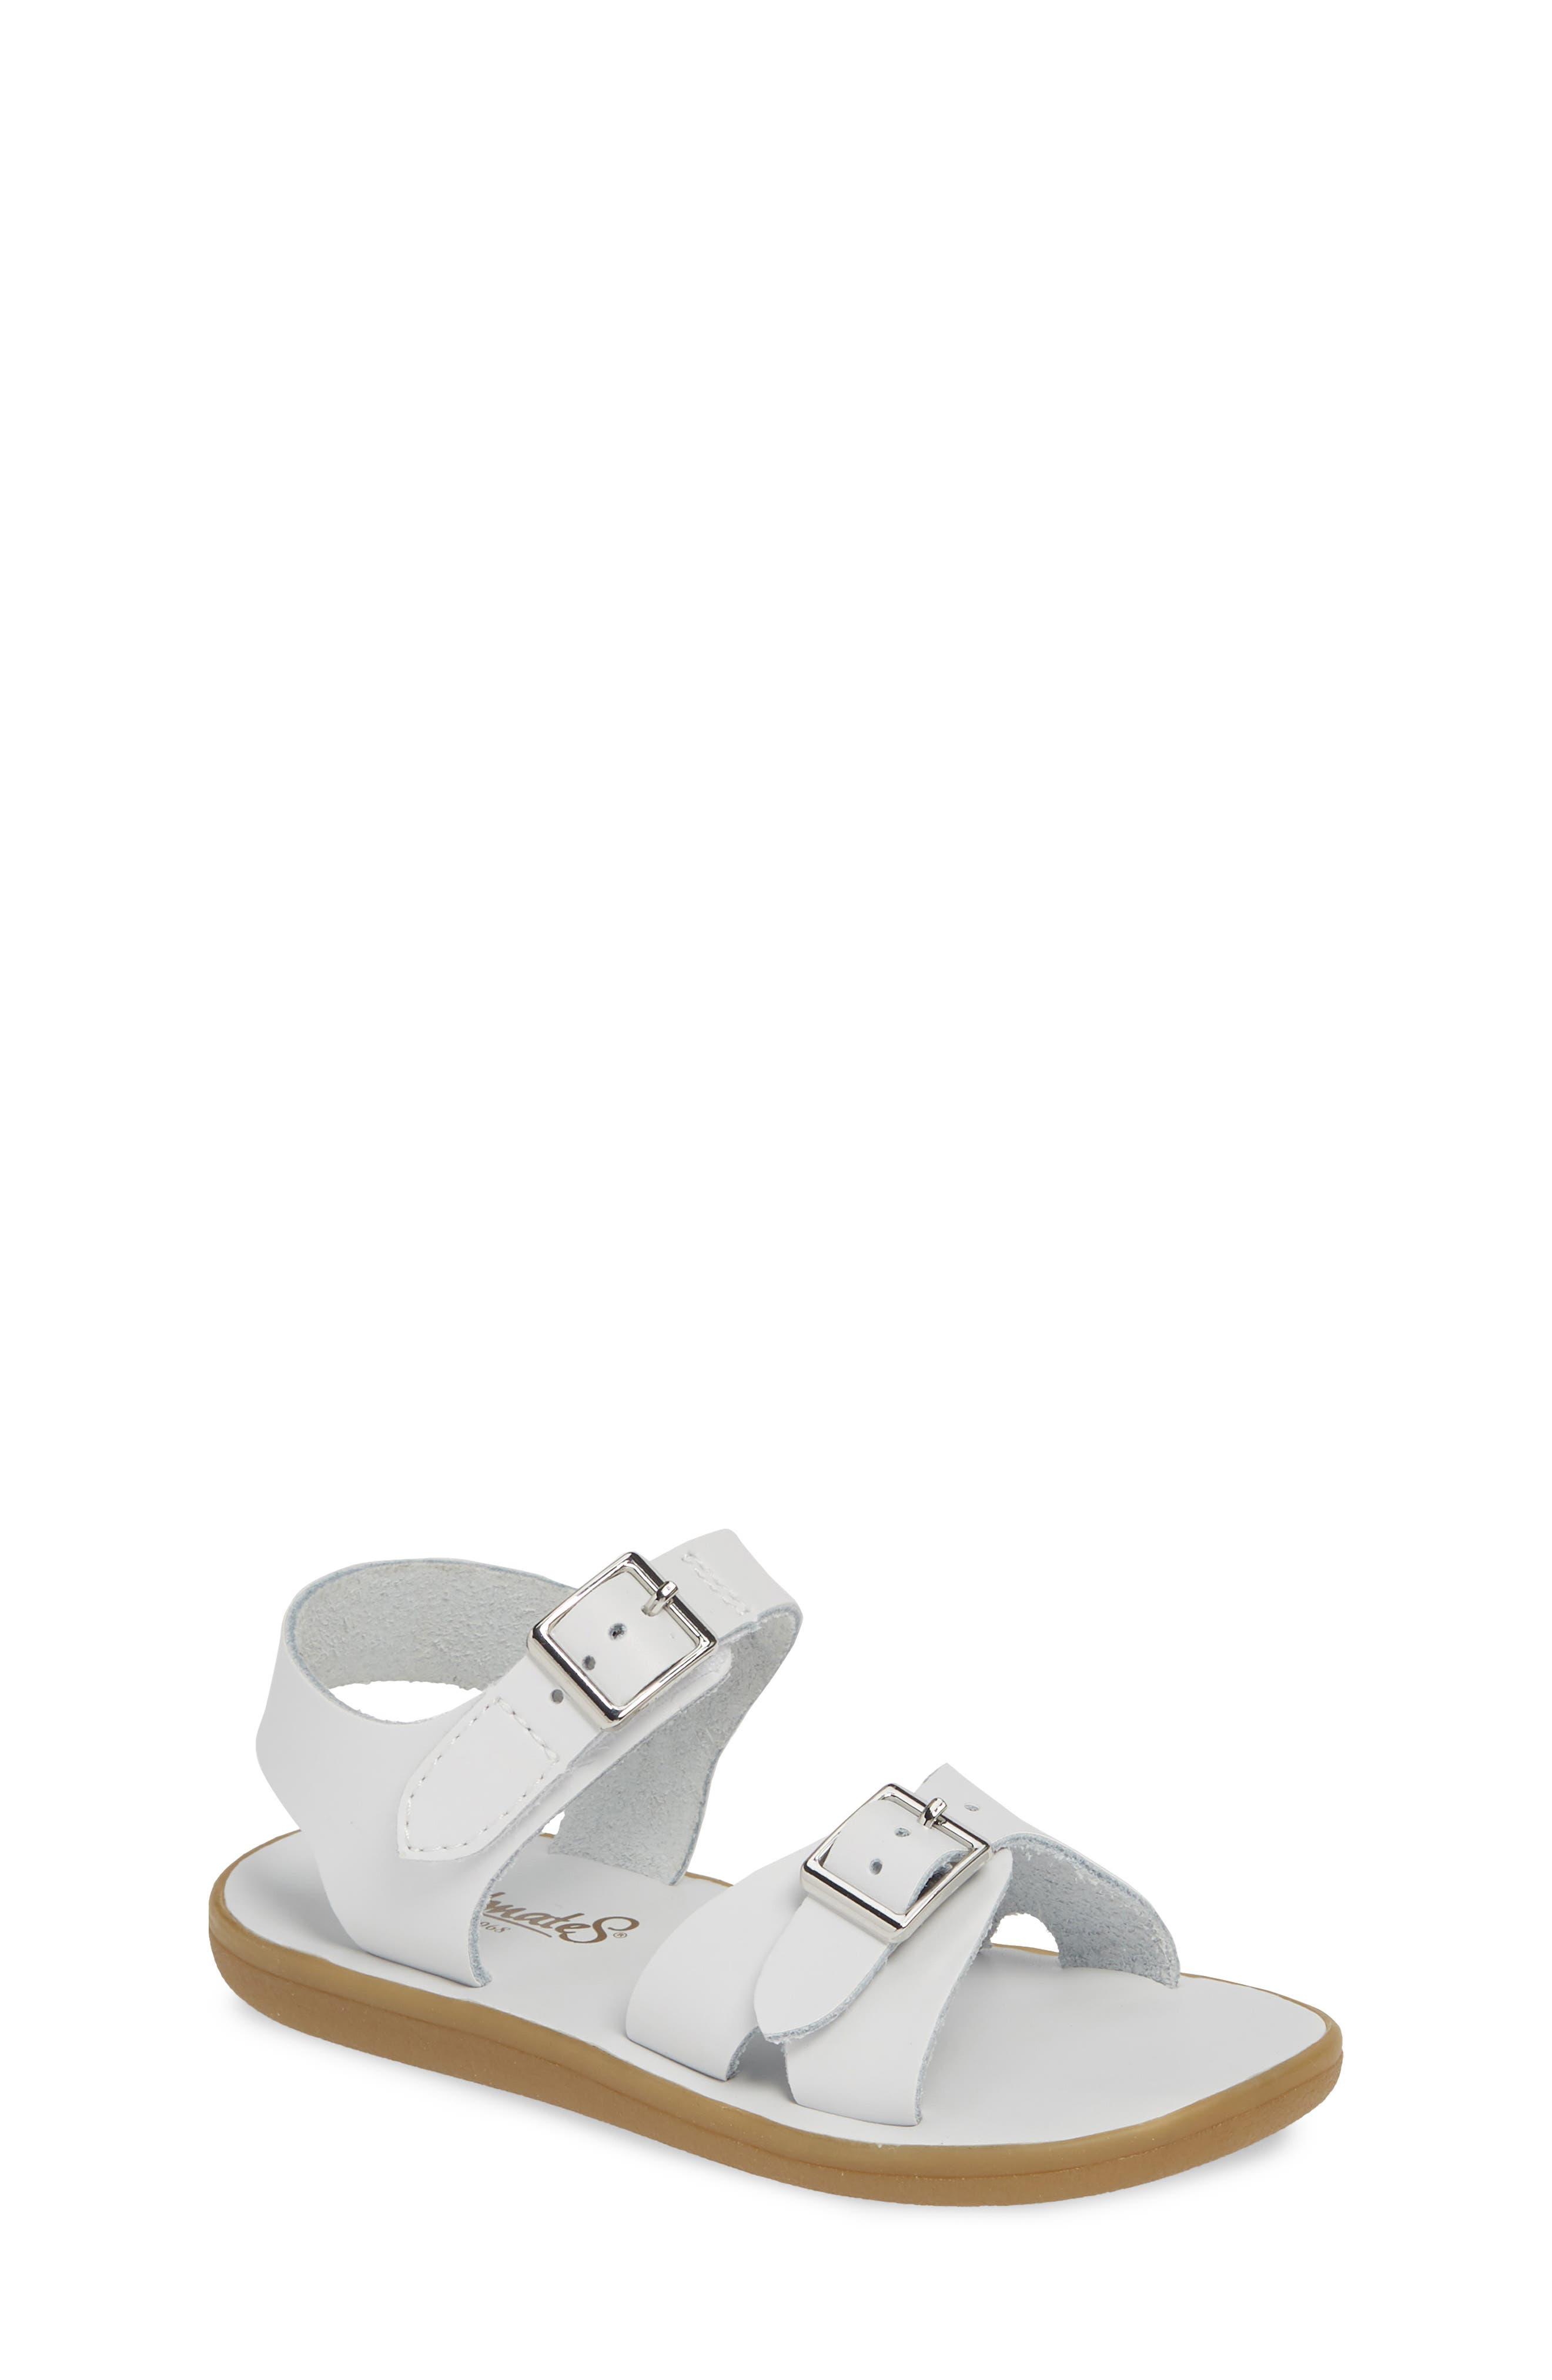 FOOTMATES Tide Waterproof Sandal, Main, color, WHITE